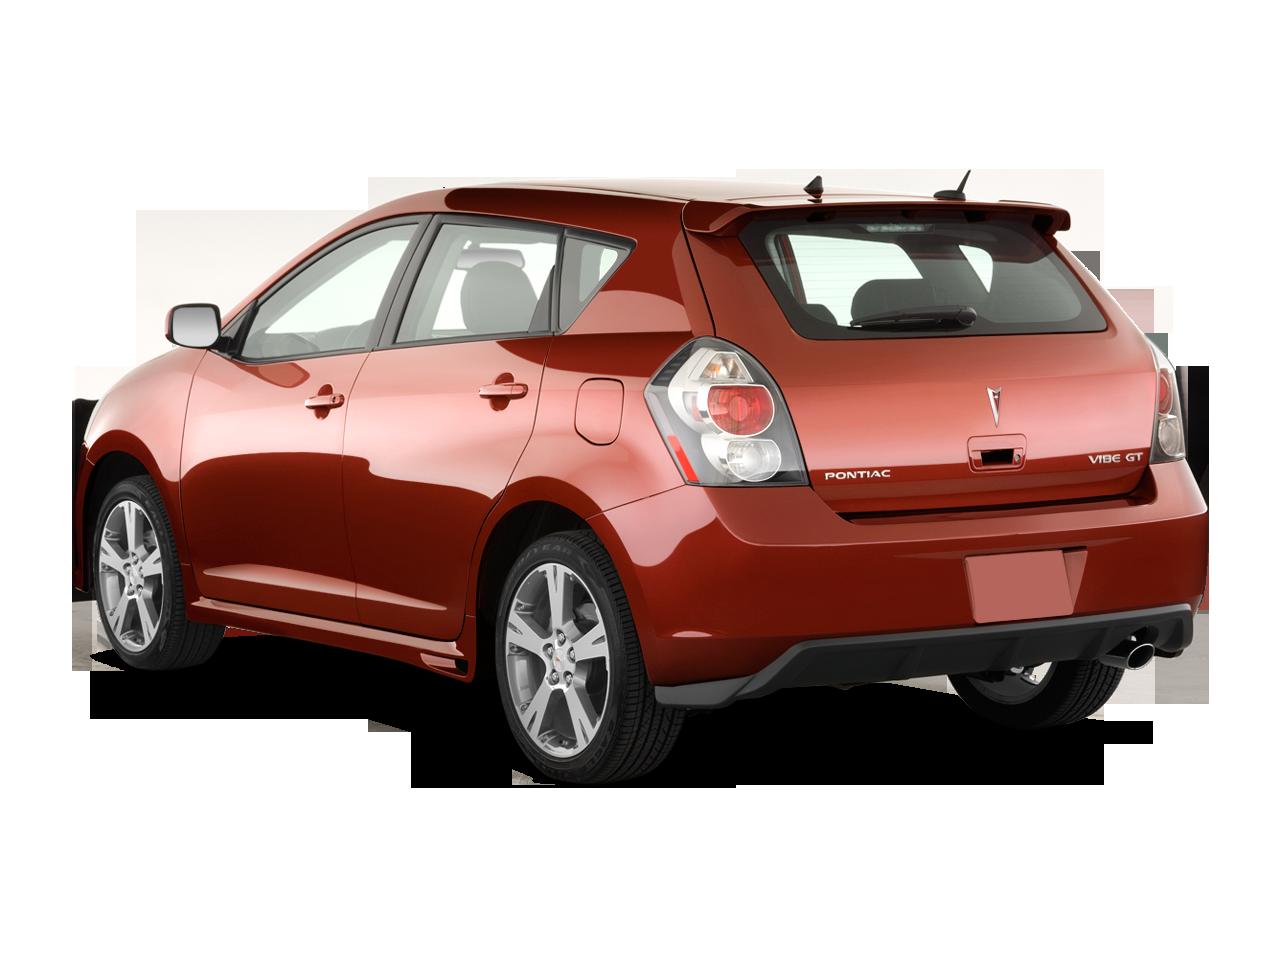 Pontiac Vibe Gt Wagon Angular Rear